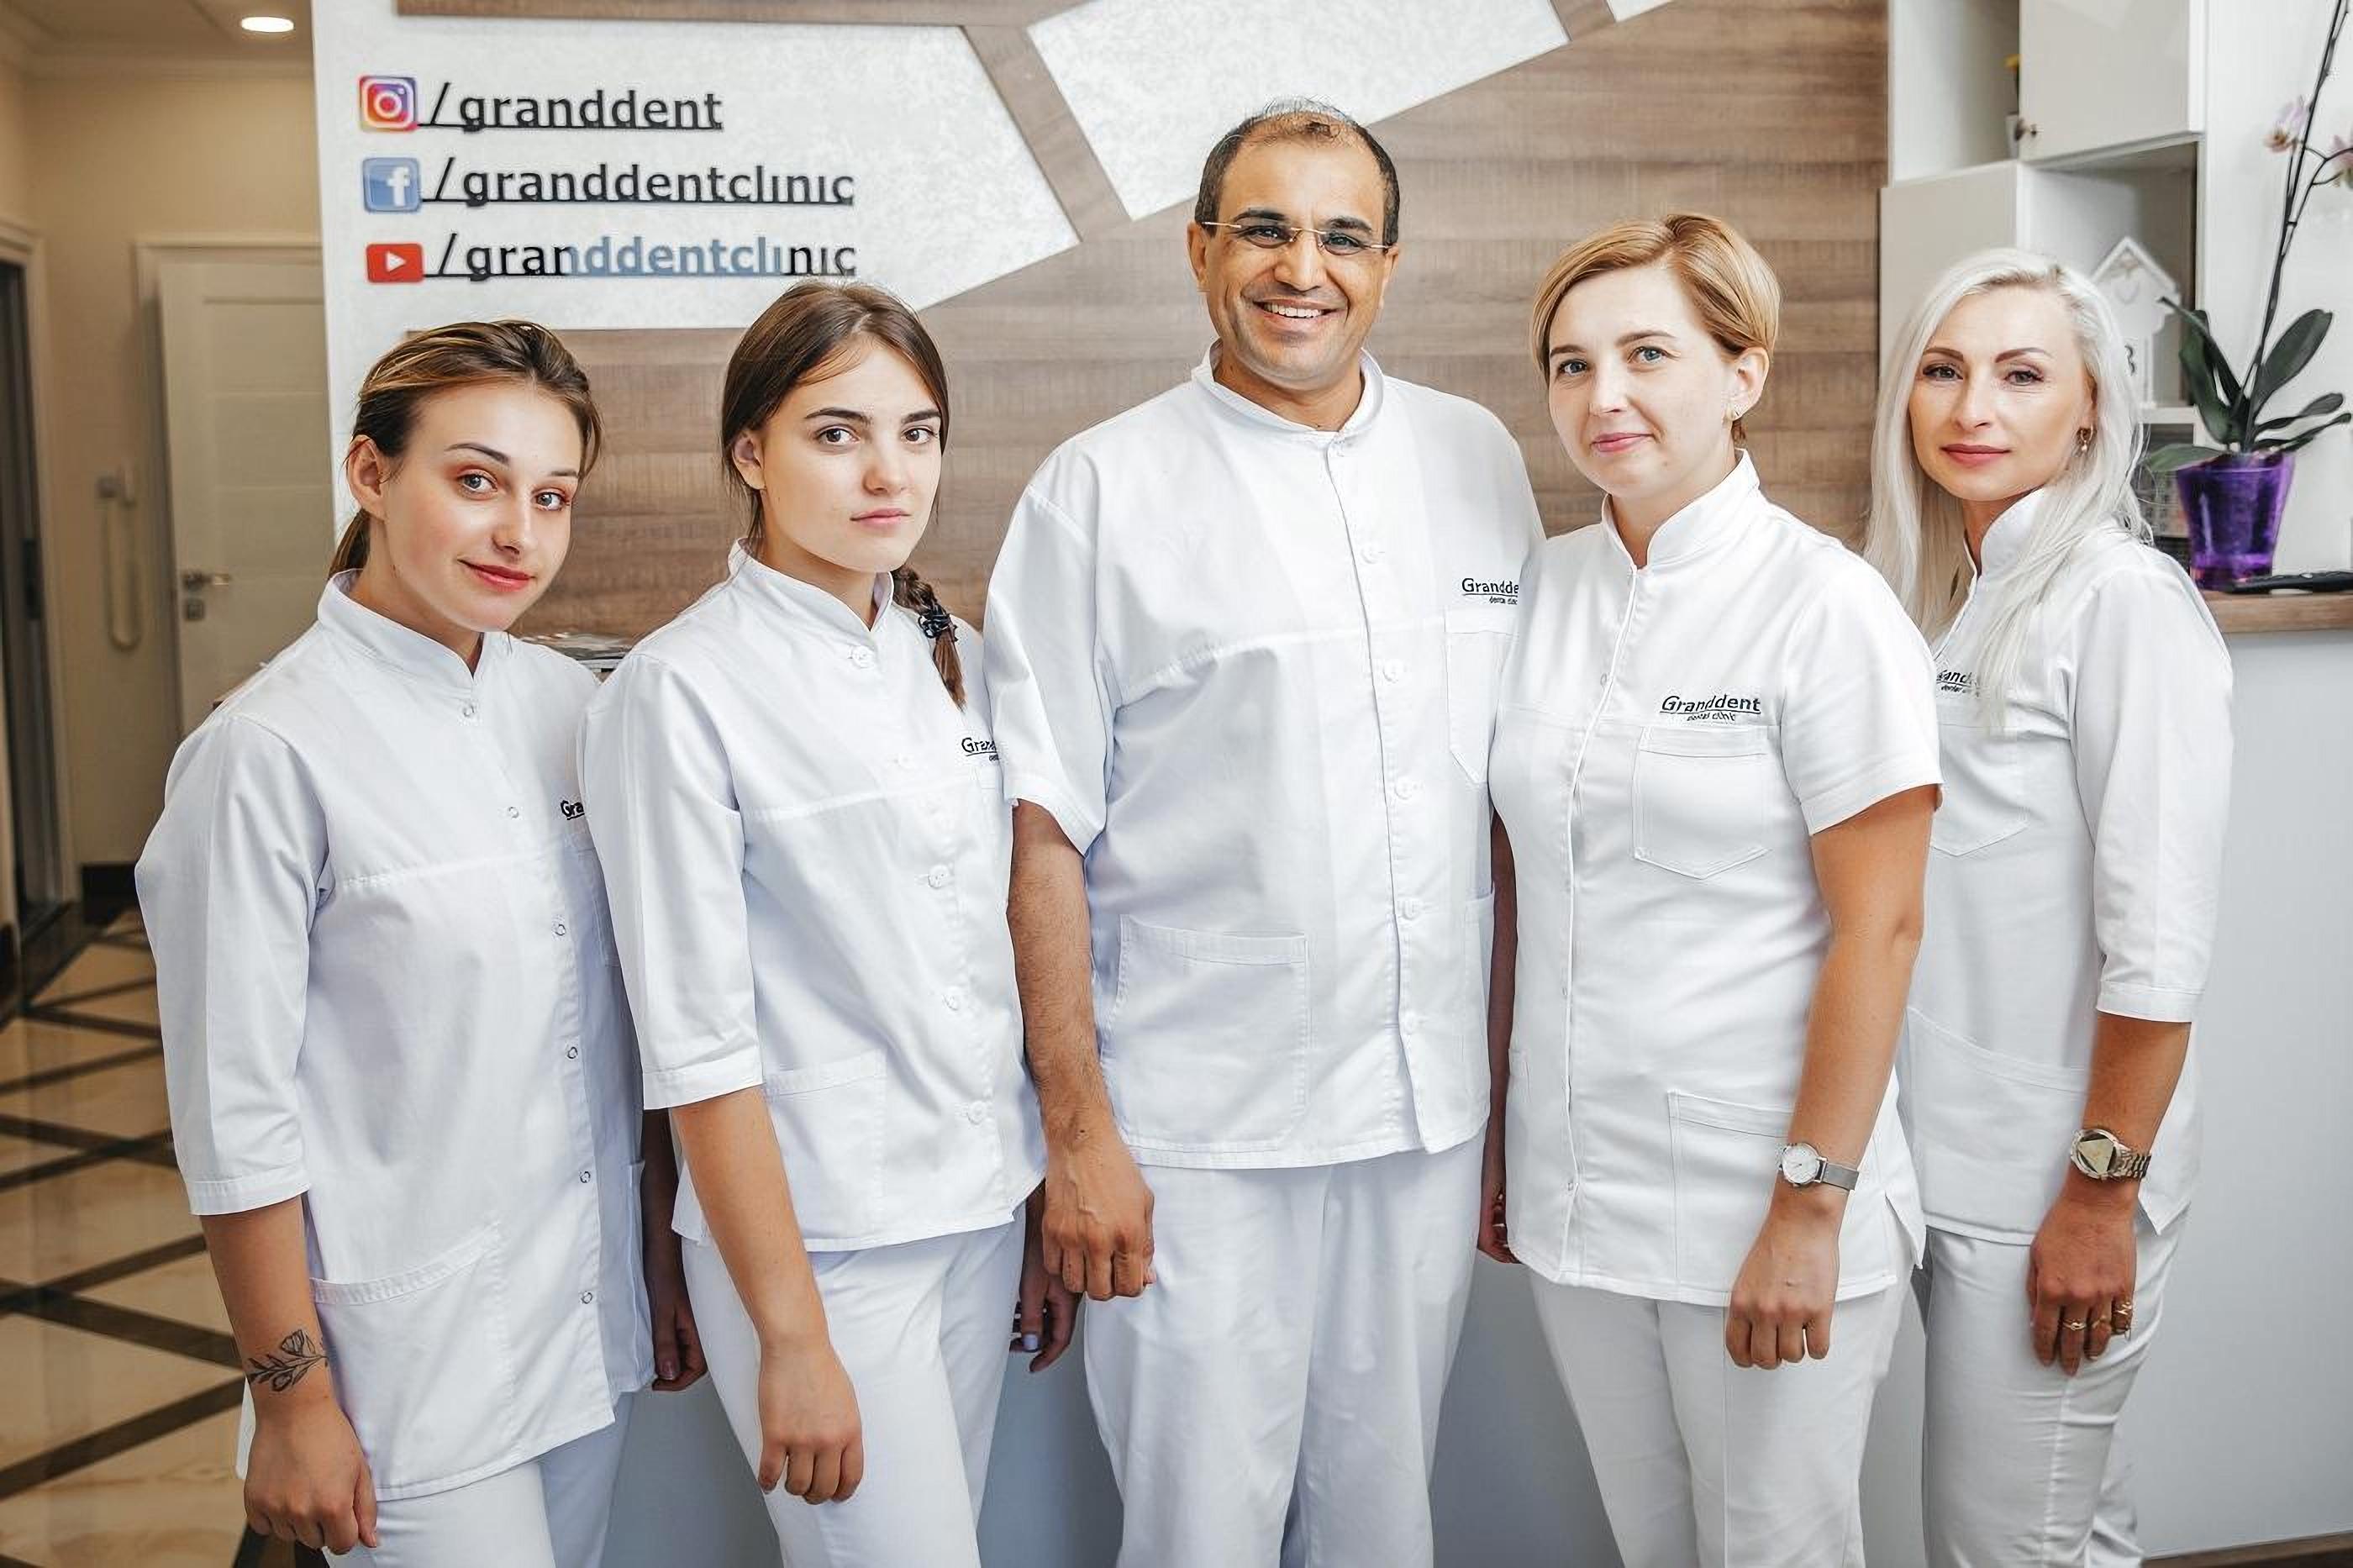 Doctors of Dental Clinic Granddent in Odessa Ukraine